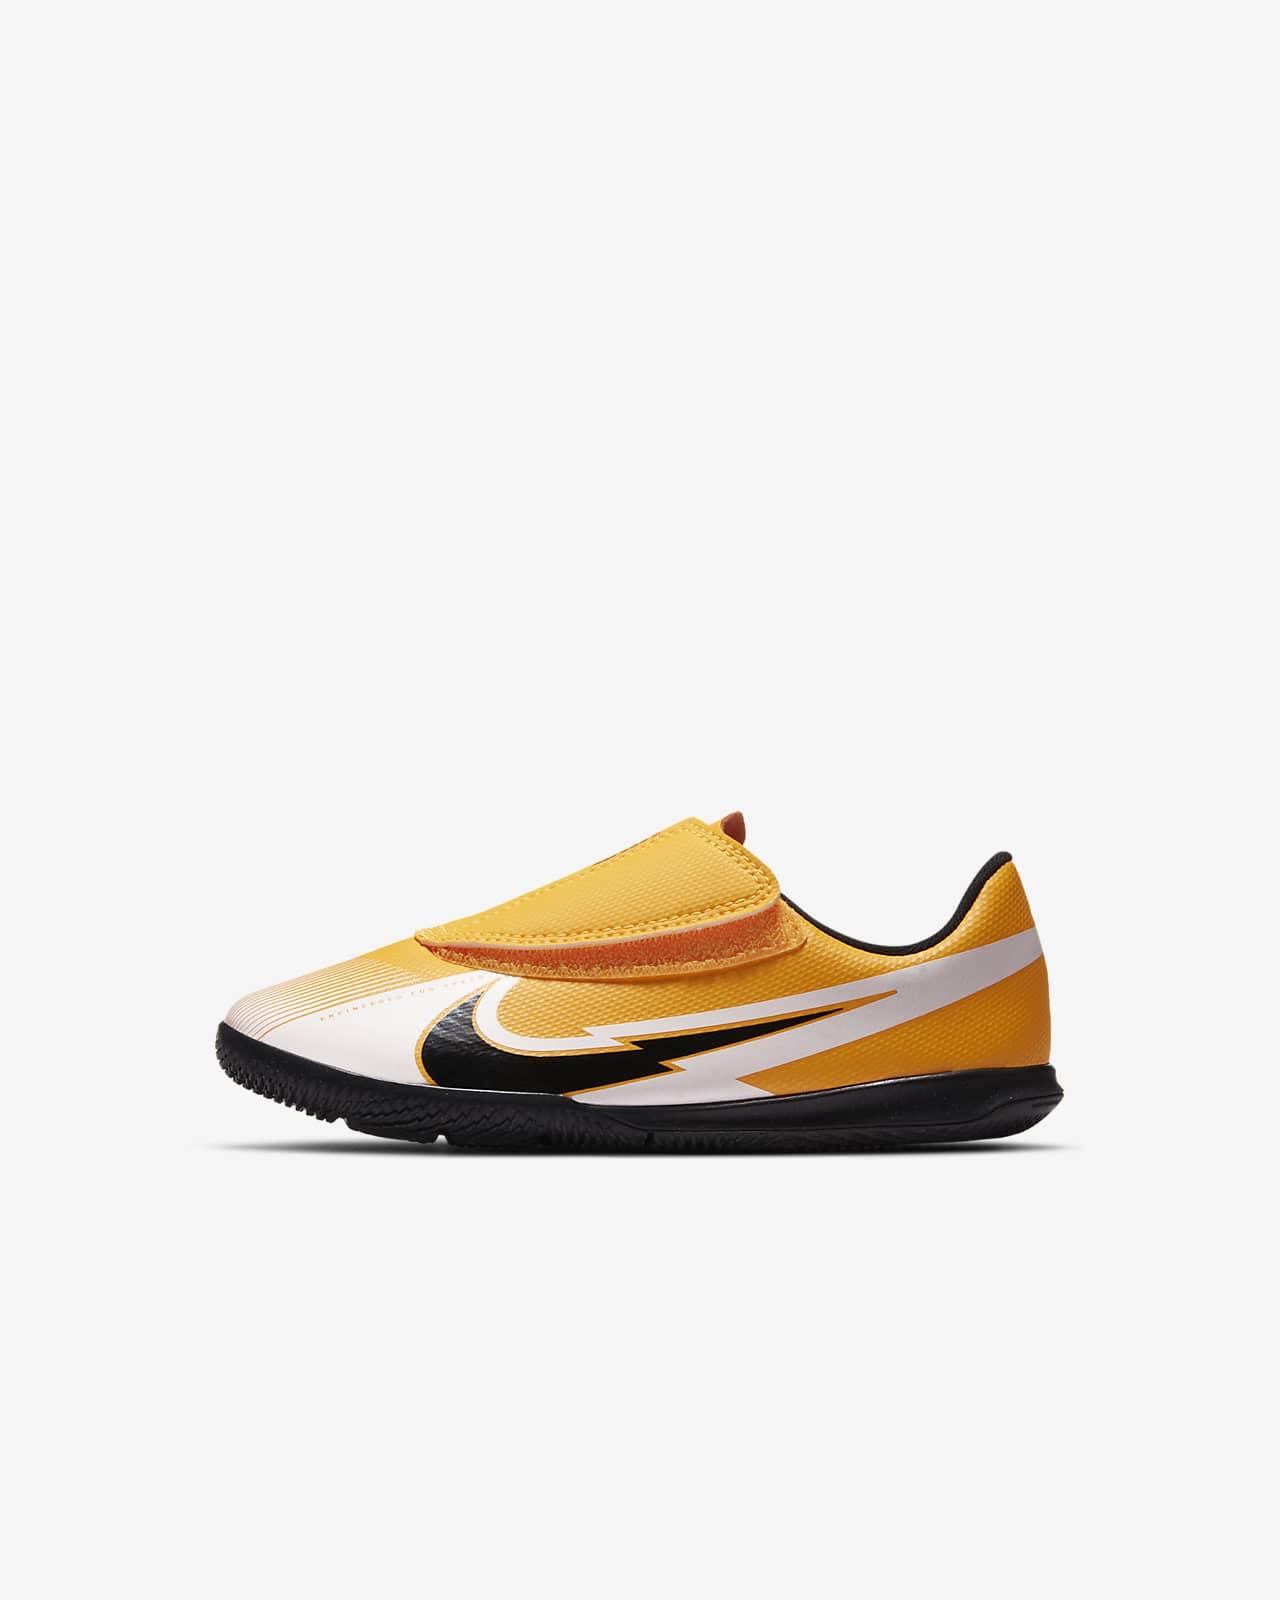 Scarpa da calcio per campi indoor/cemento Nike Jr. Mercurial Vapor 13 Club IC - Bimbi piccoli/Bambini